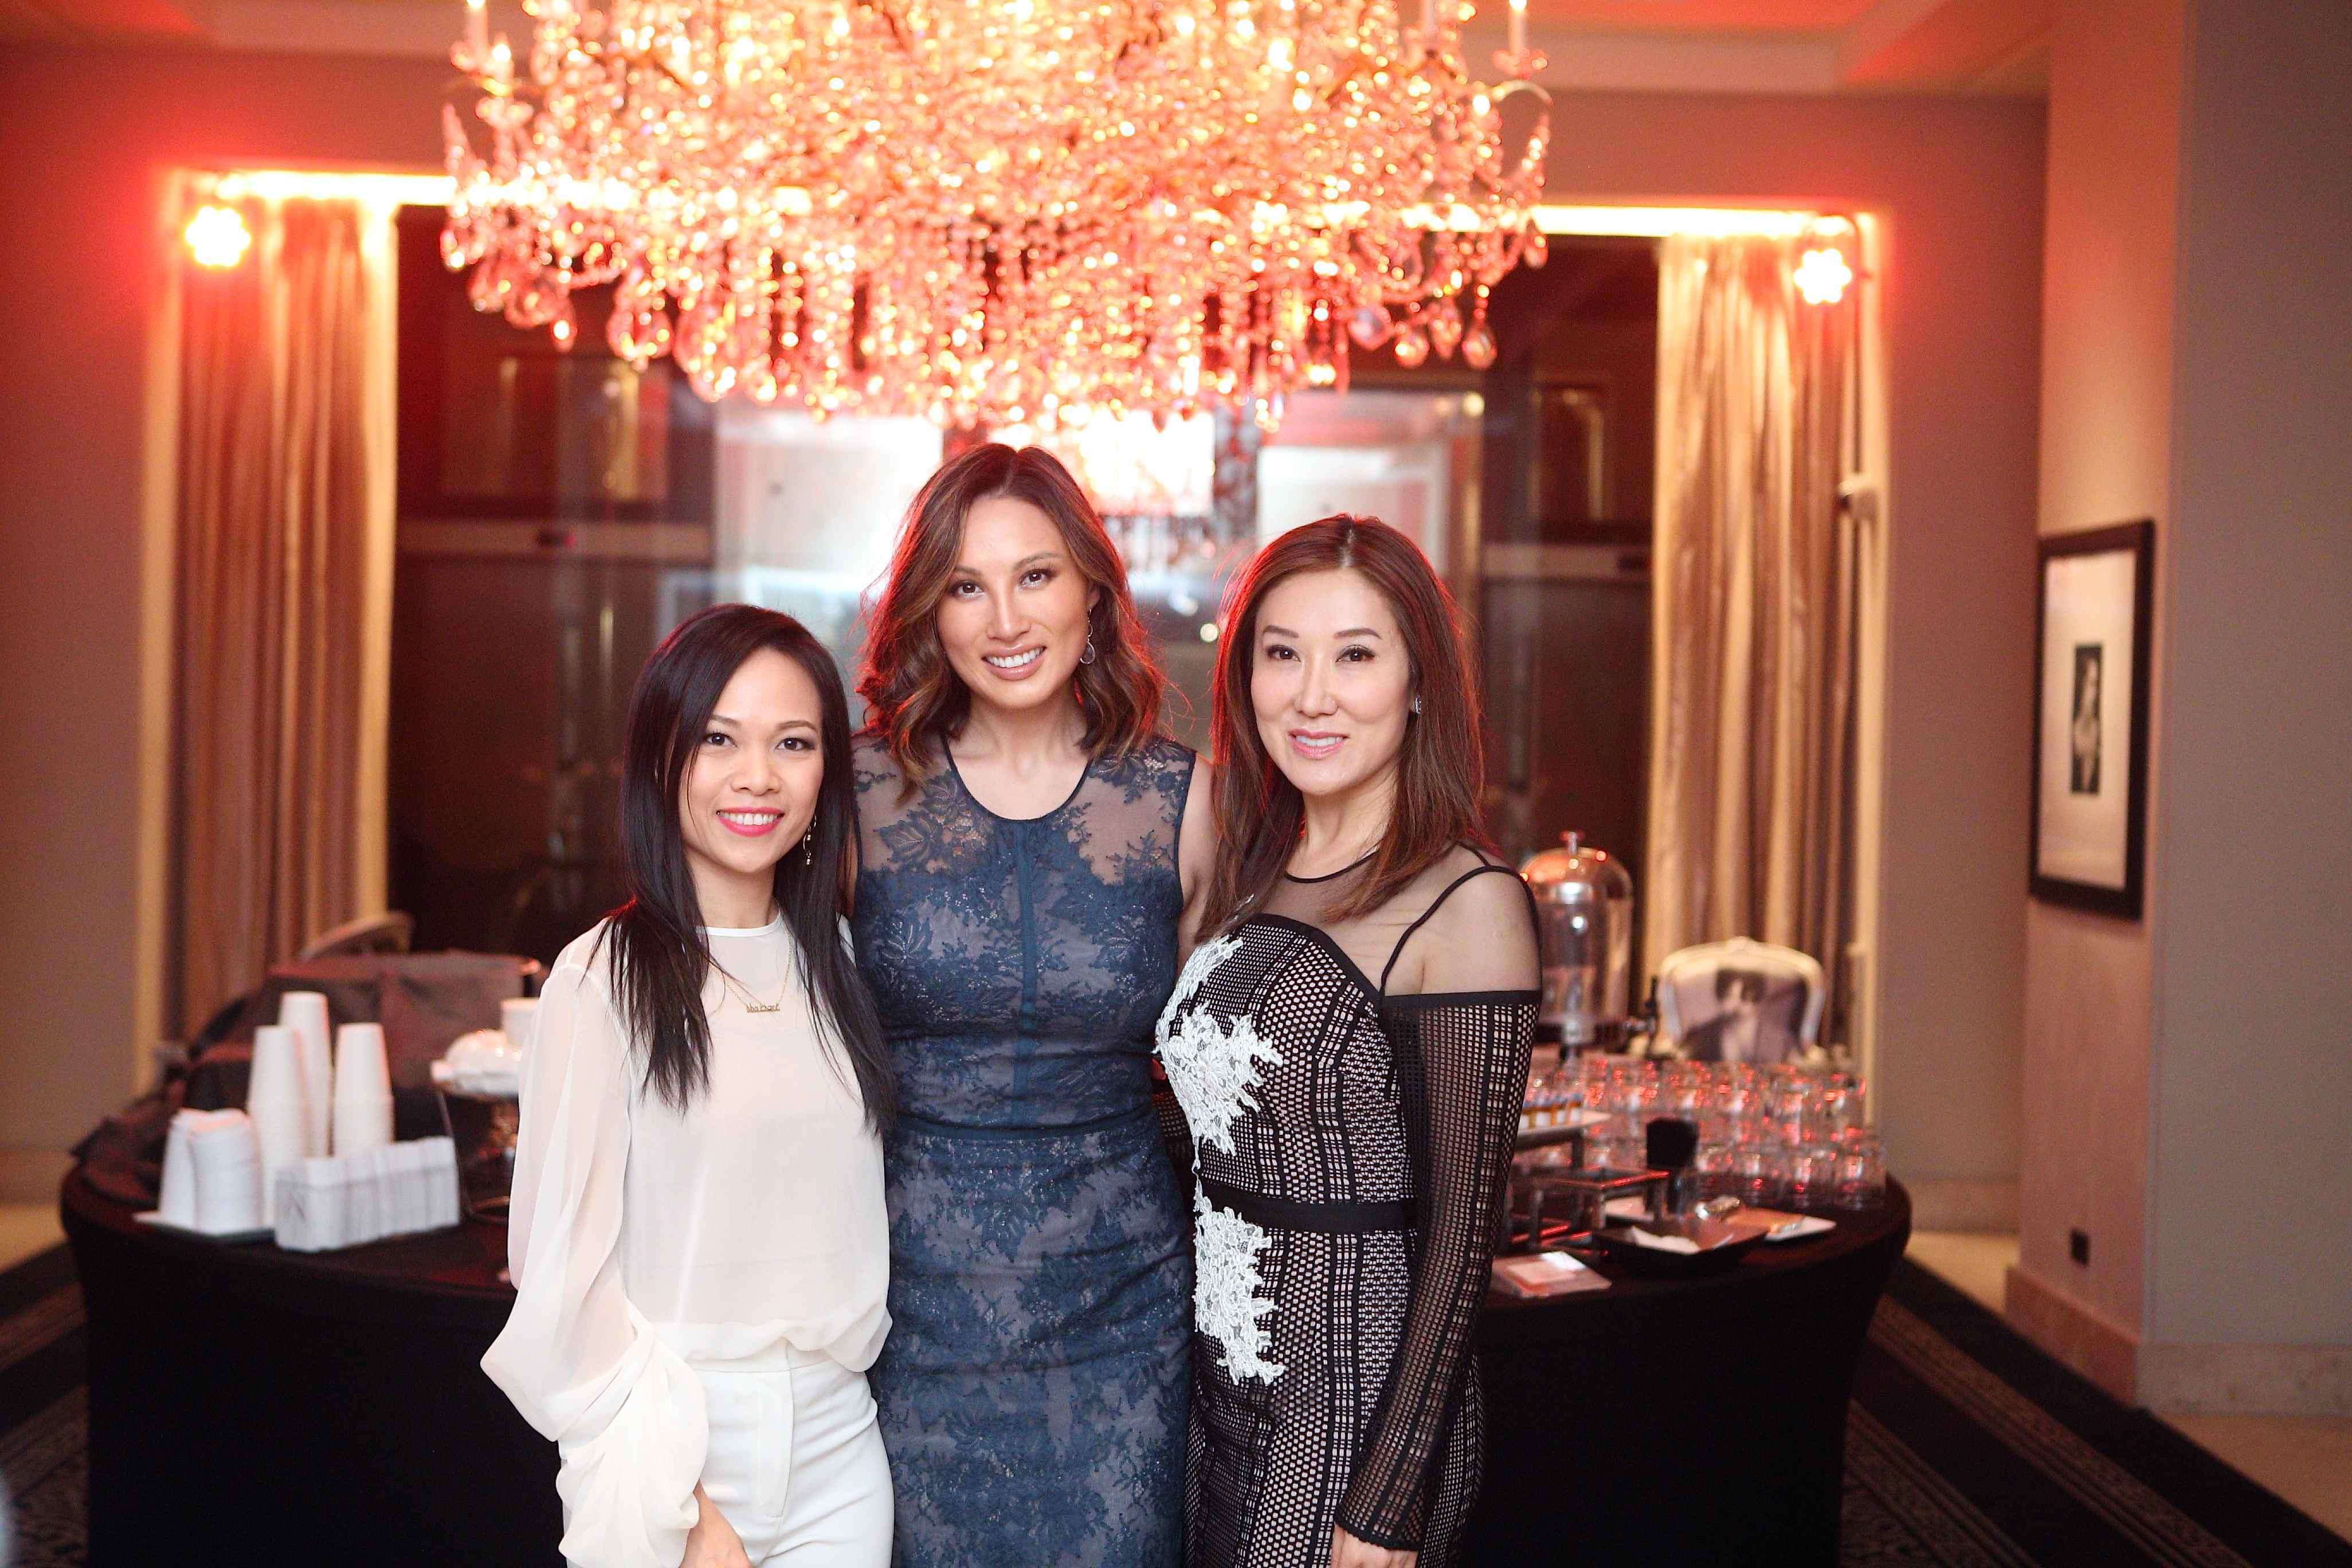 Khanh Nguyen, Mina Trinity Chang, Mandy Kao